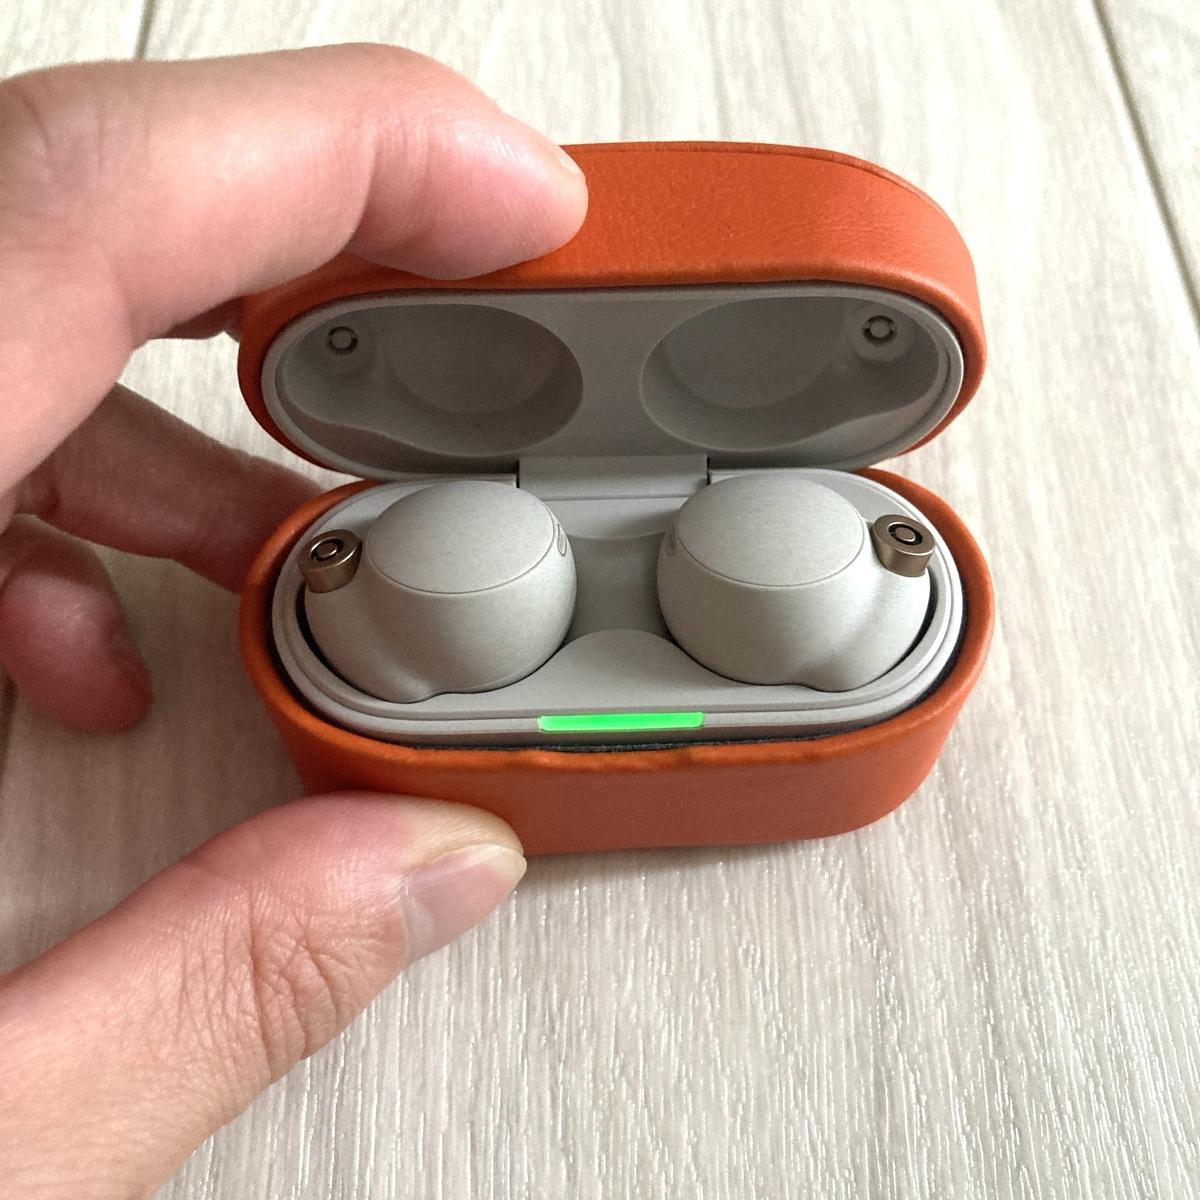 Sony WF-1000XM4 完全ワイヤレスイヤホン WF-1000XM3 Bluetooth イヤホン ヘッドホン SBC aptx LDAC Apple AirPods Pro PUレザー フェイクレザー